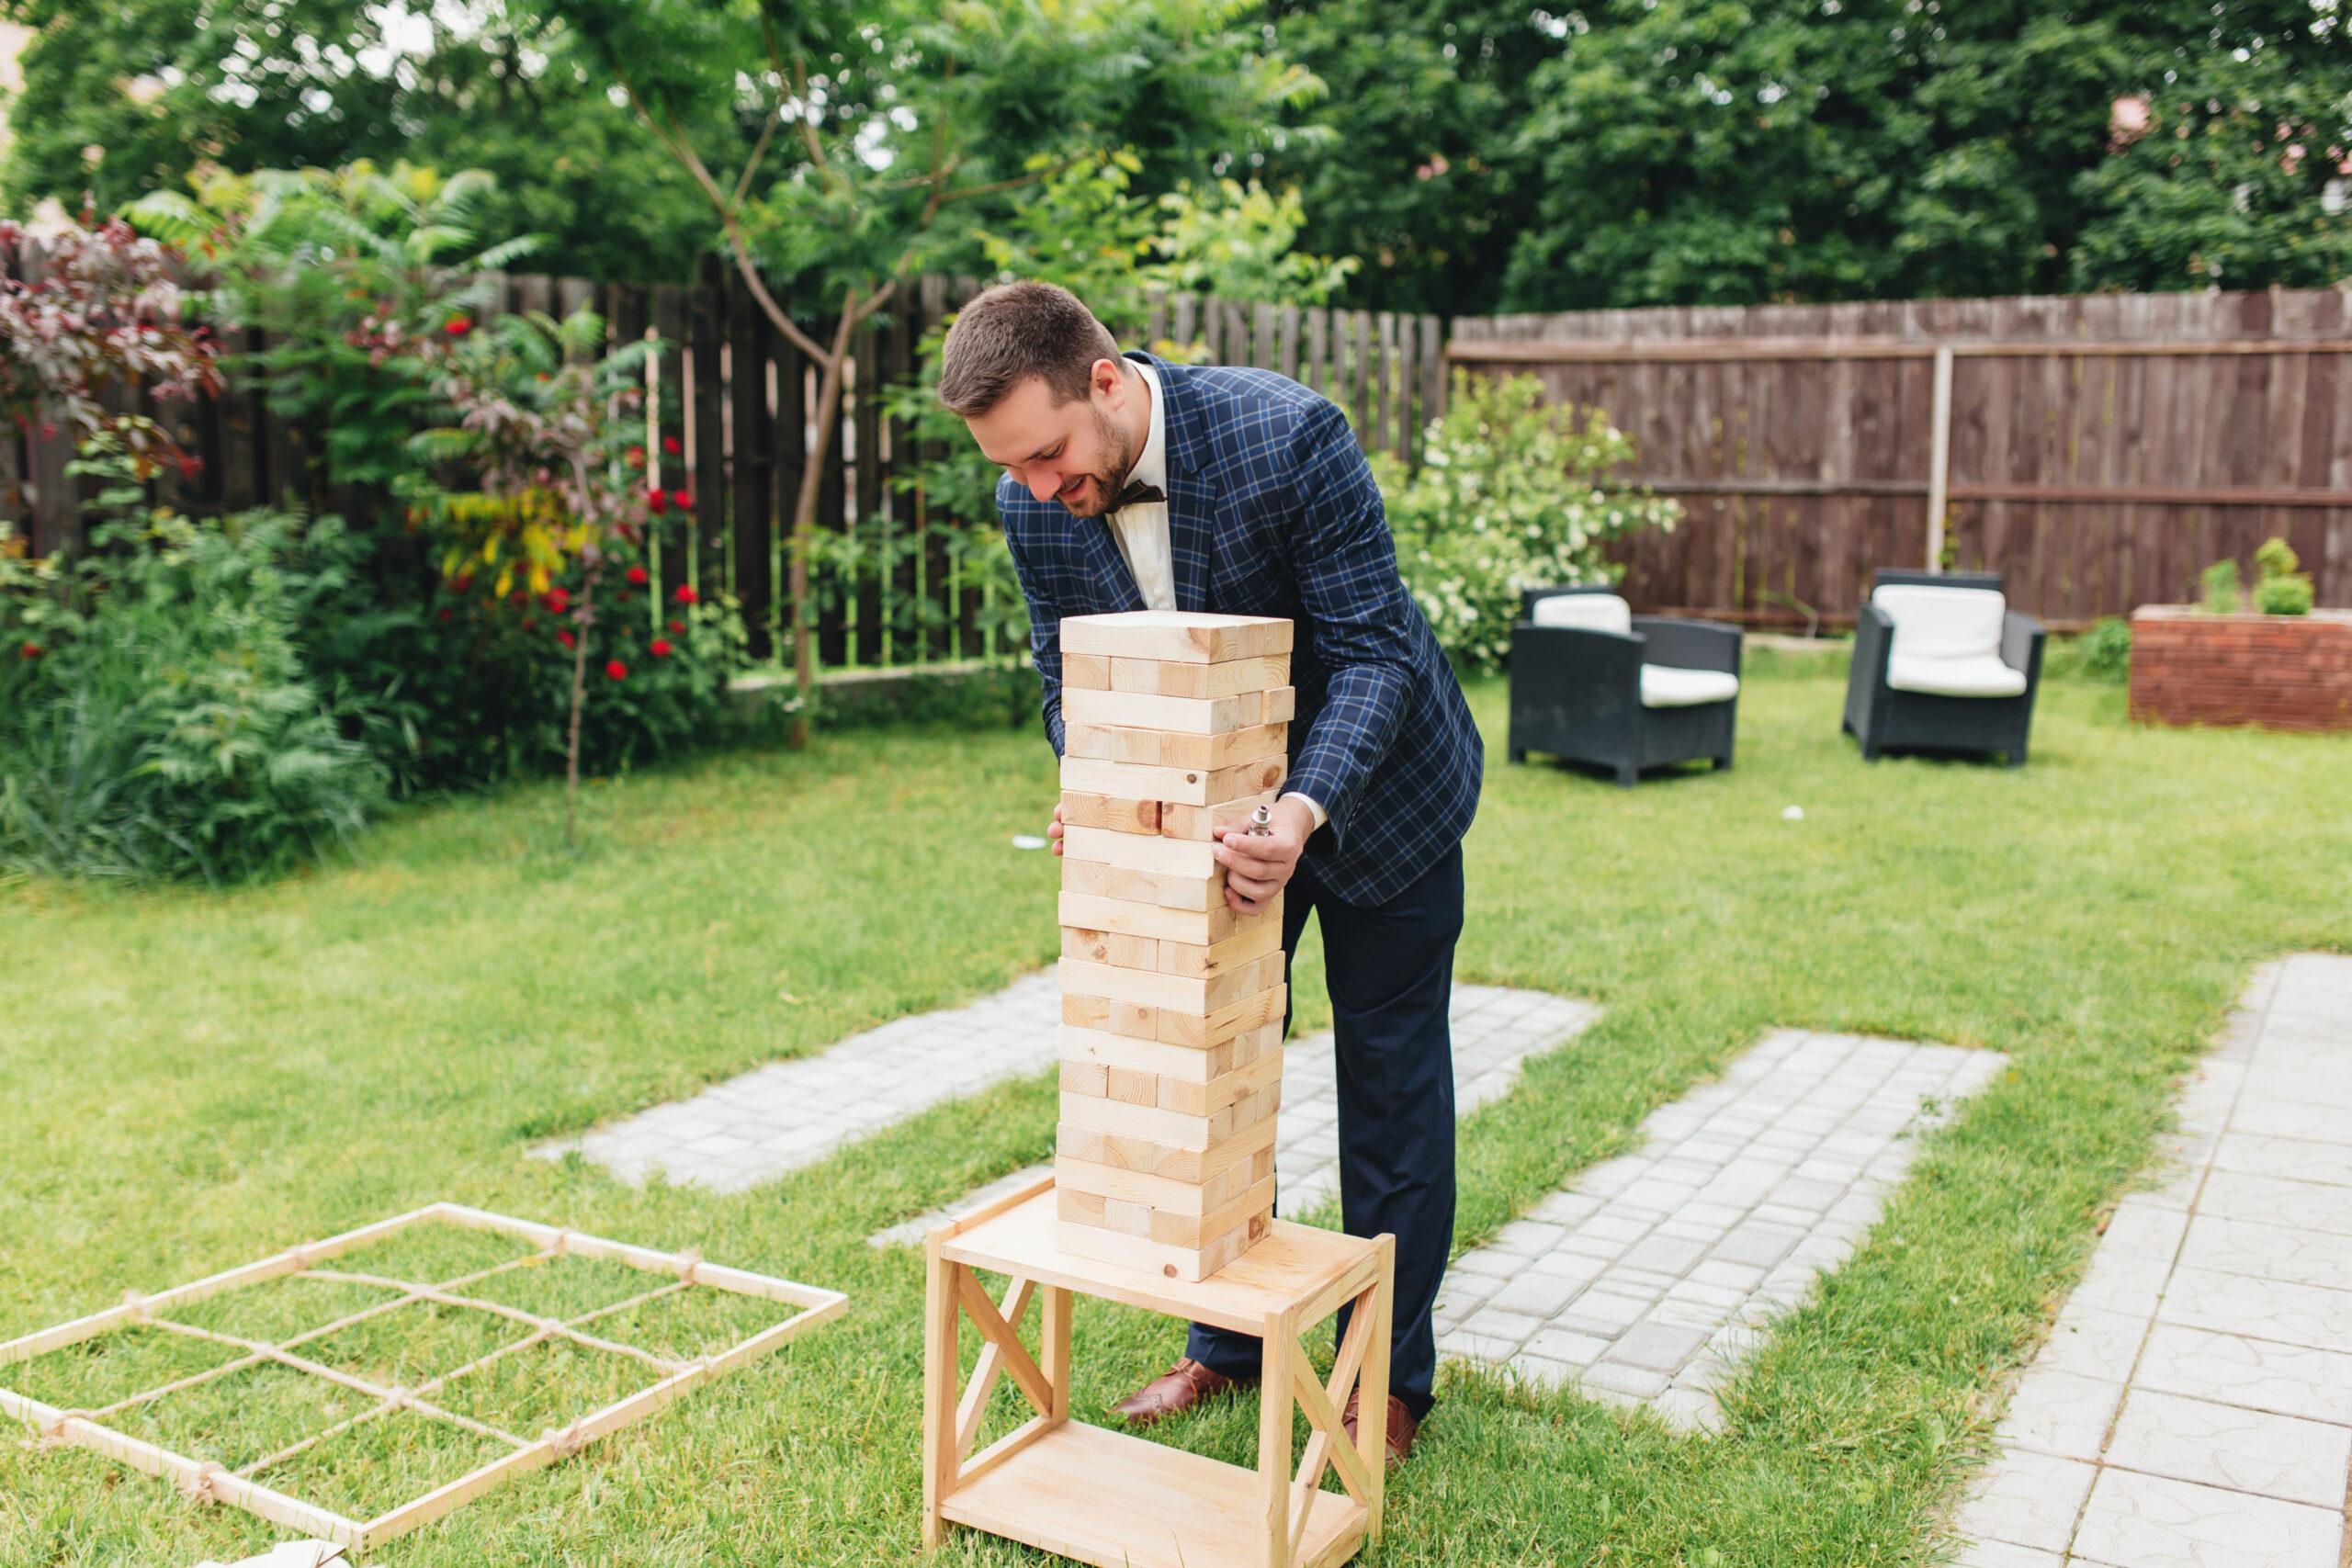 summer wedding   summer   wedding   summer wedding ideas   easy summer wedding ideas   wedding ideas